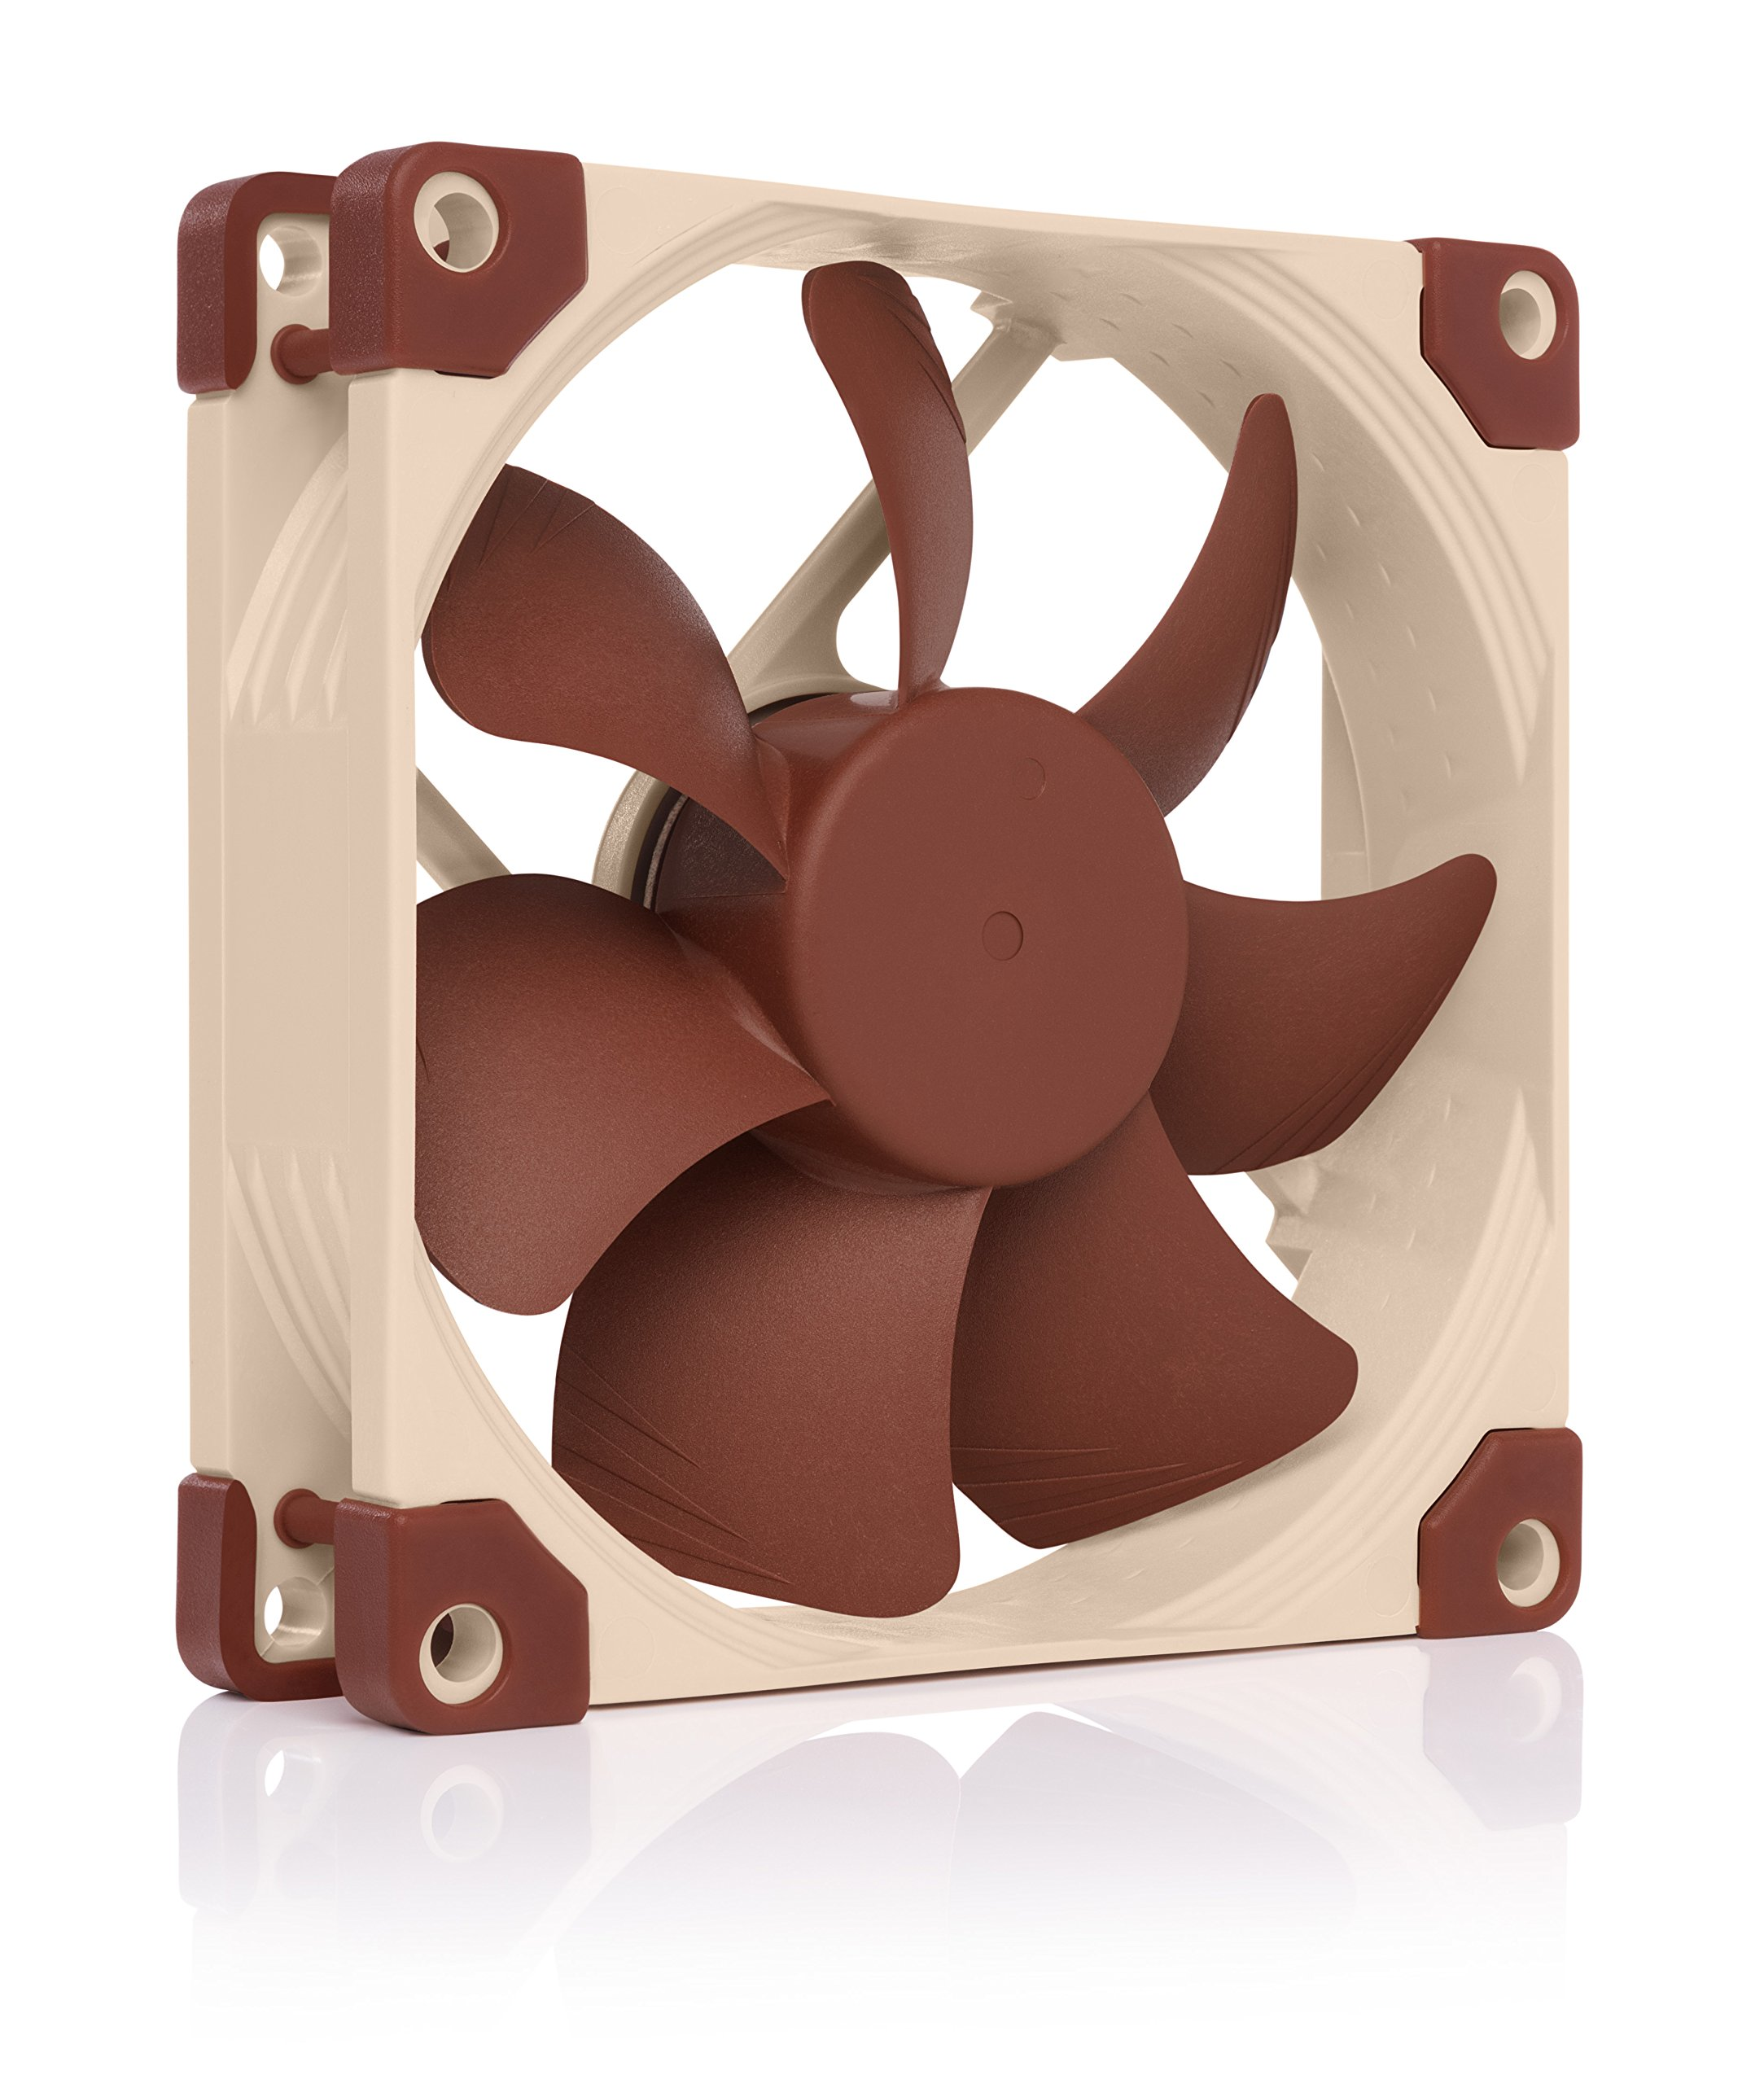 Noctua NF-A9 PWM, 4-Pin Premium Cooling Fan (92mm, Brown) by NOCTUA